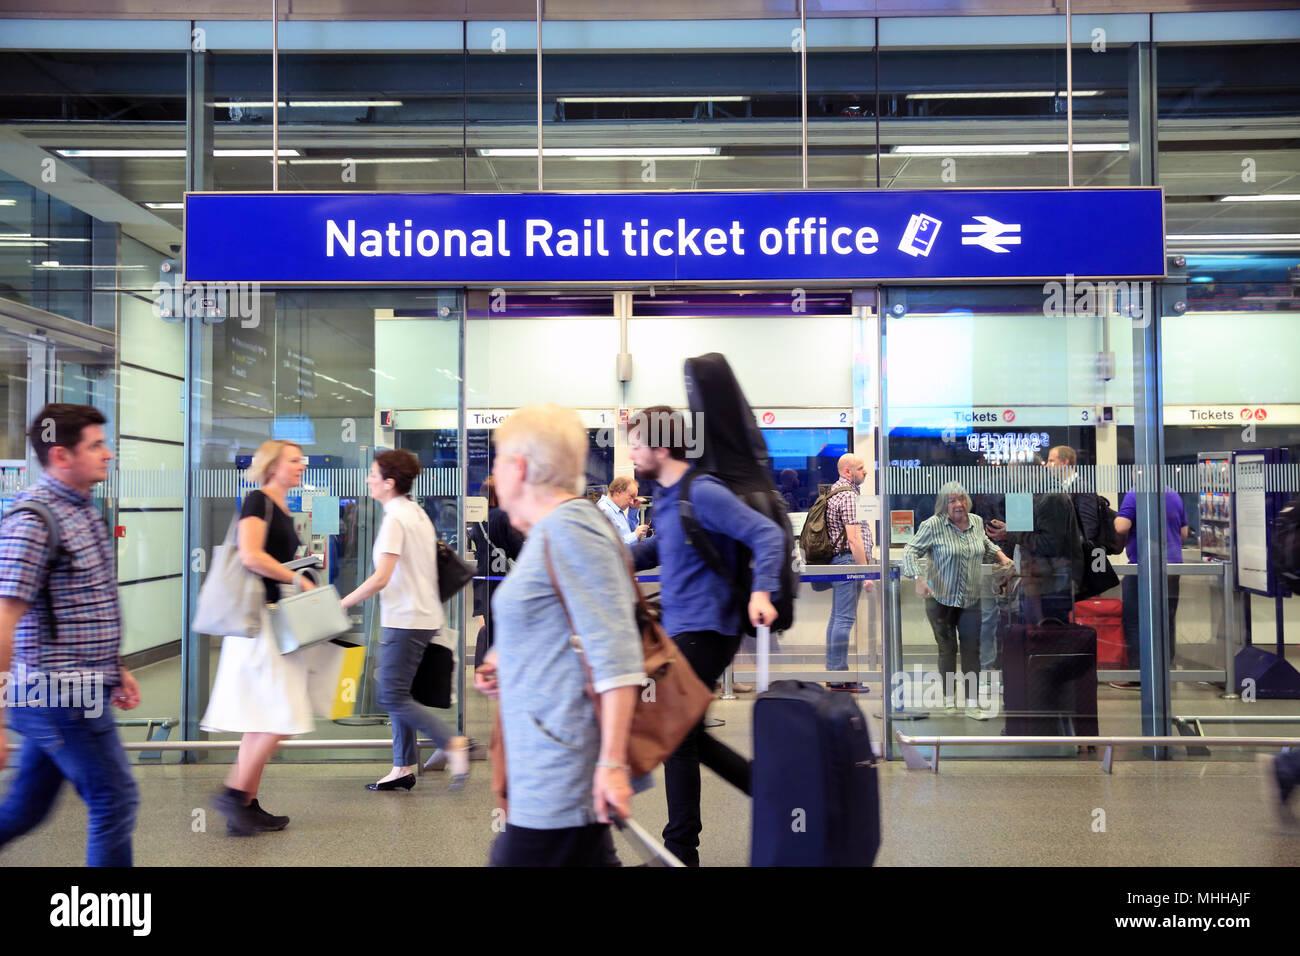 National Rail Ticket Office at St Pancras train station, London, UK - Stock Image